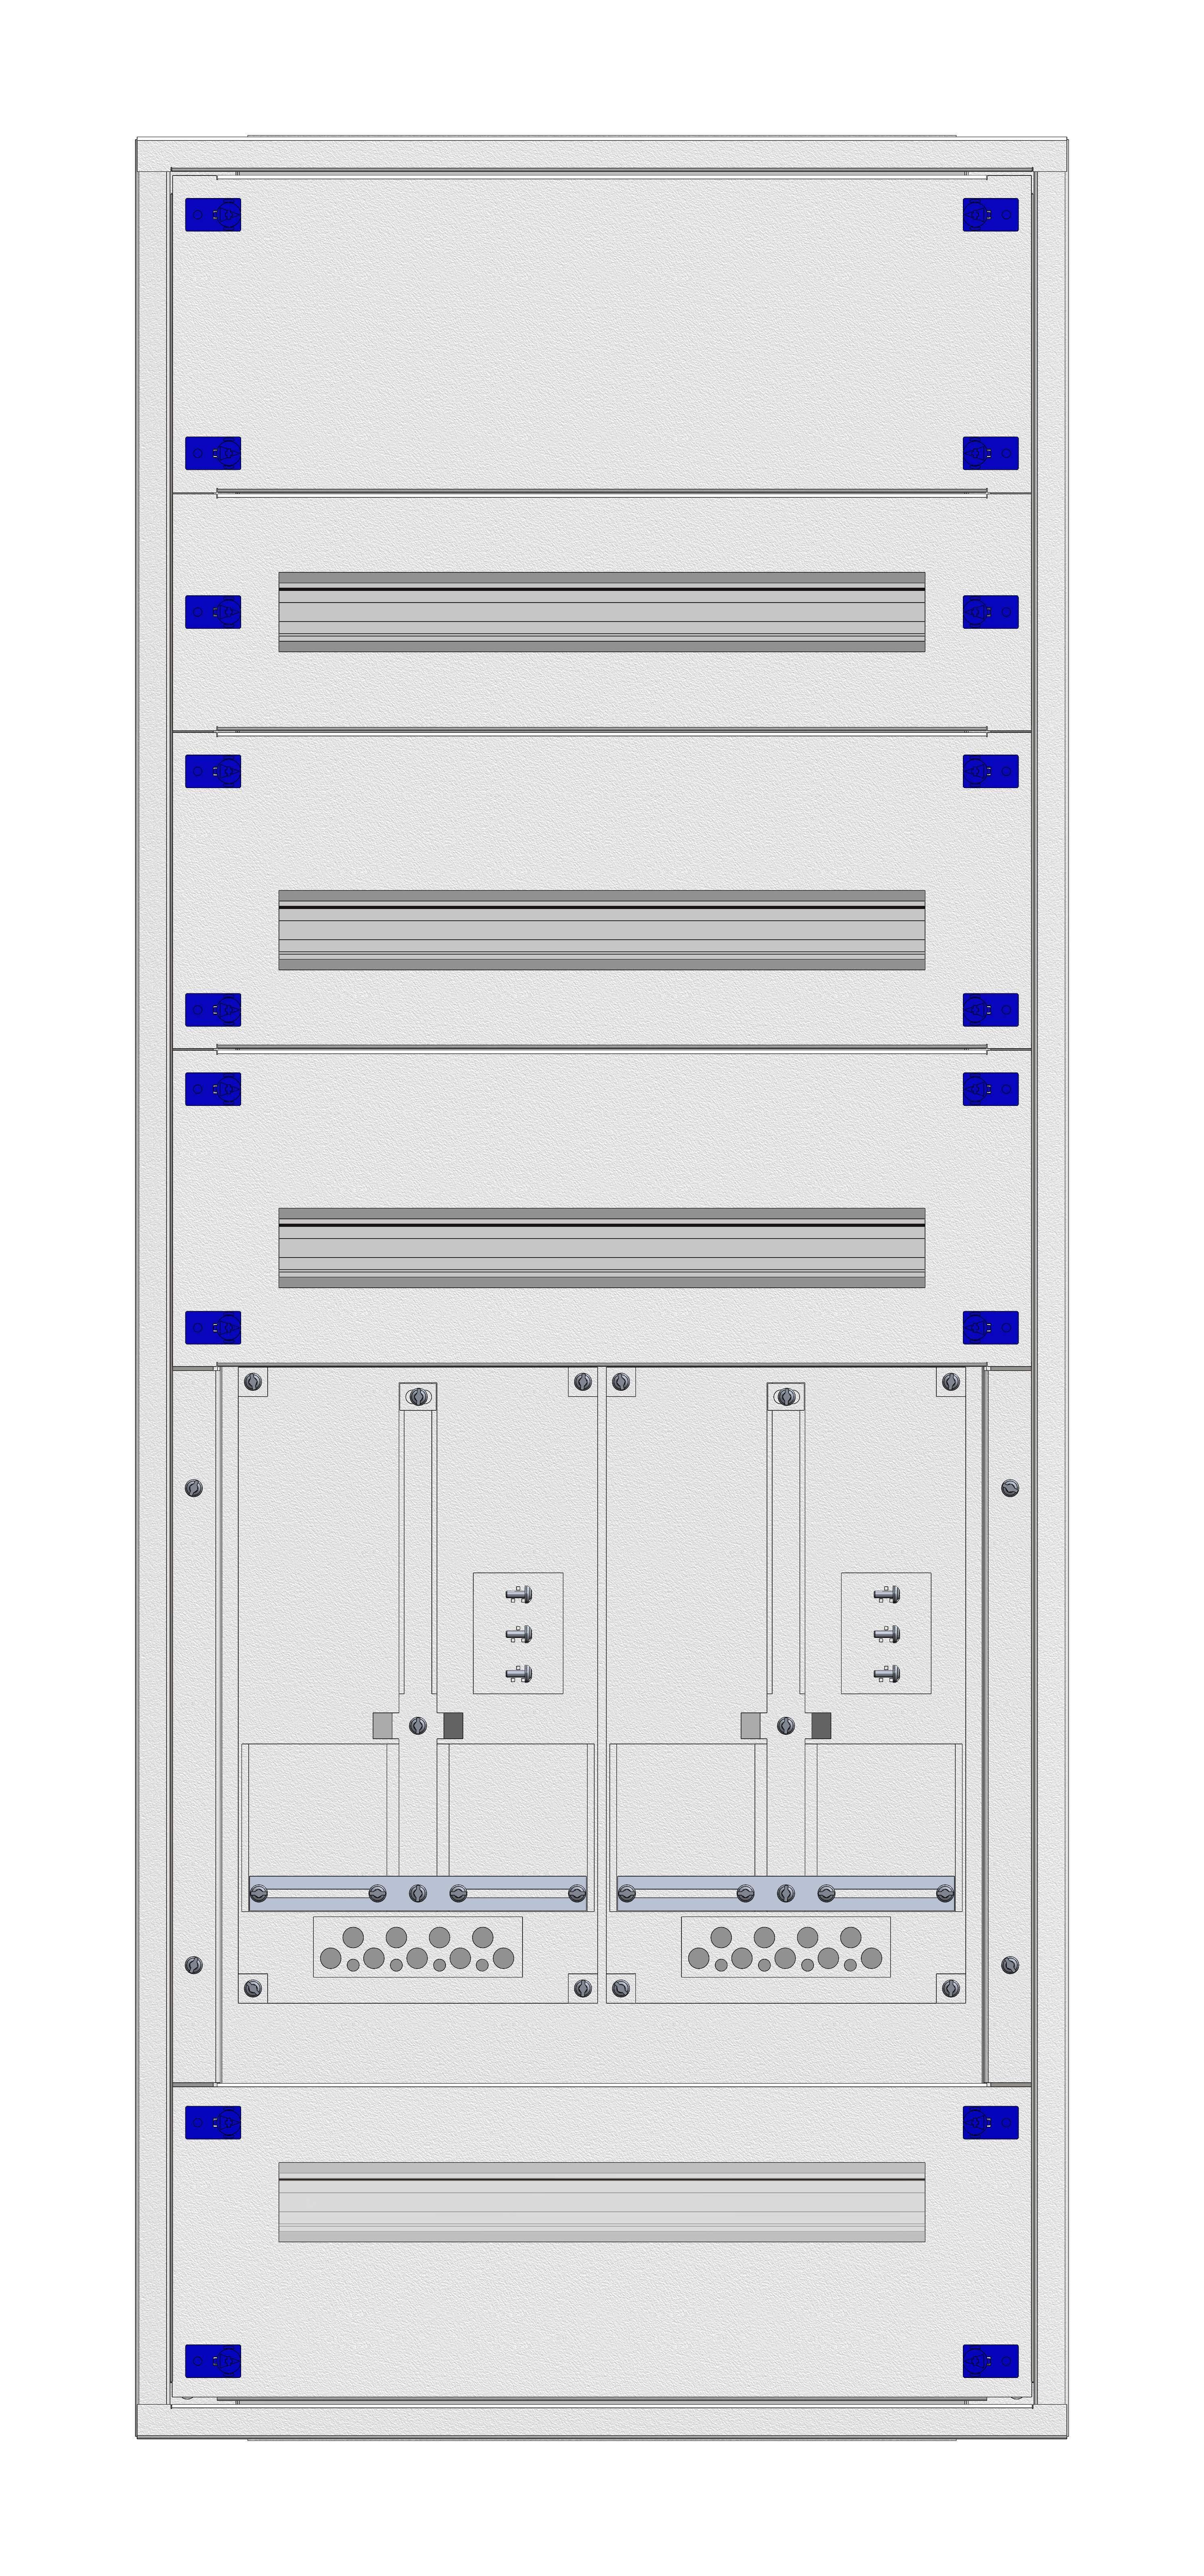 1 Stk Aufputz-Zählerverteiler 2A-28E/VBG 2ZP, H1380B590T250mm IL160228VS